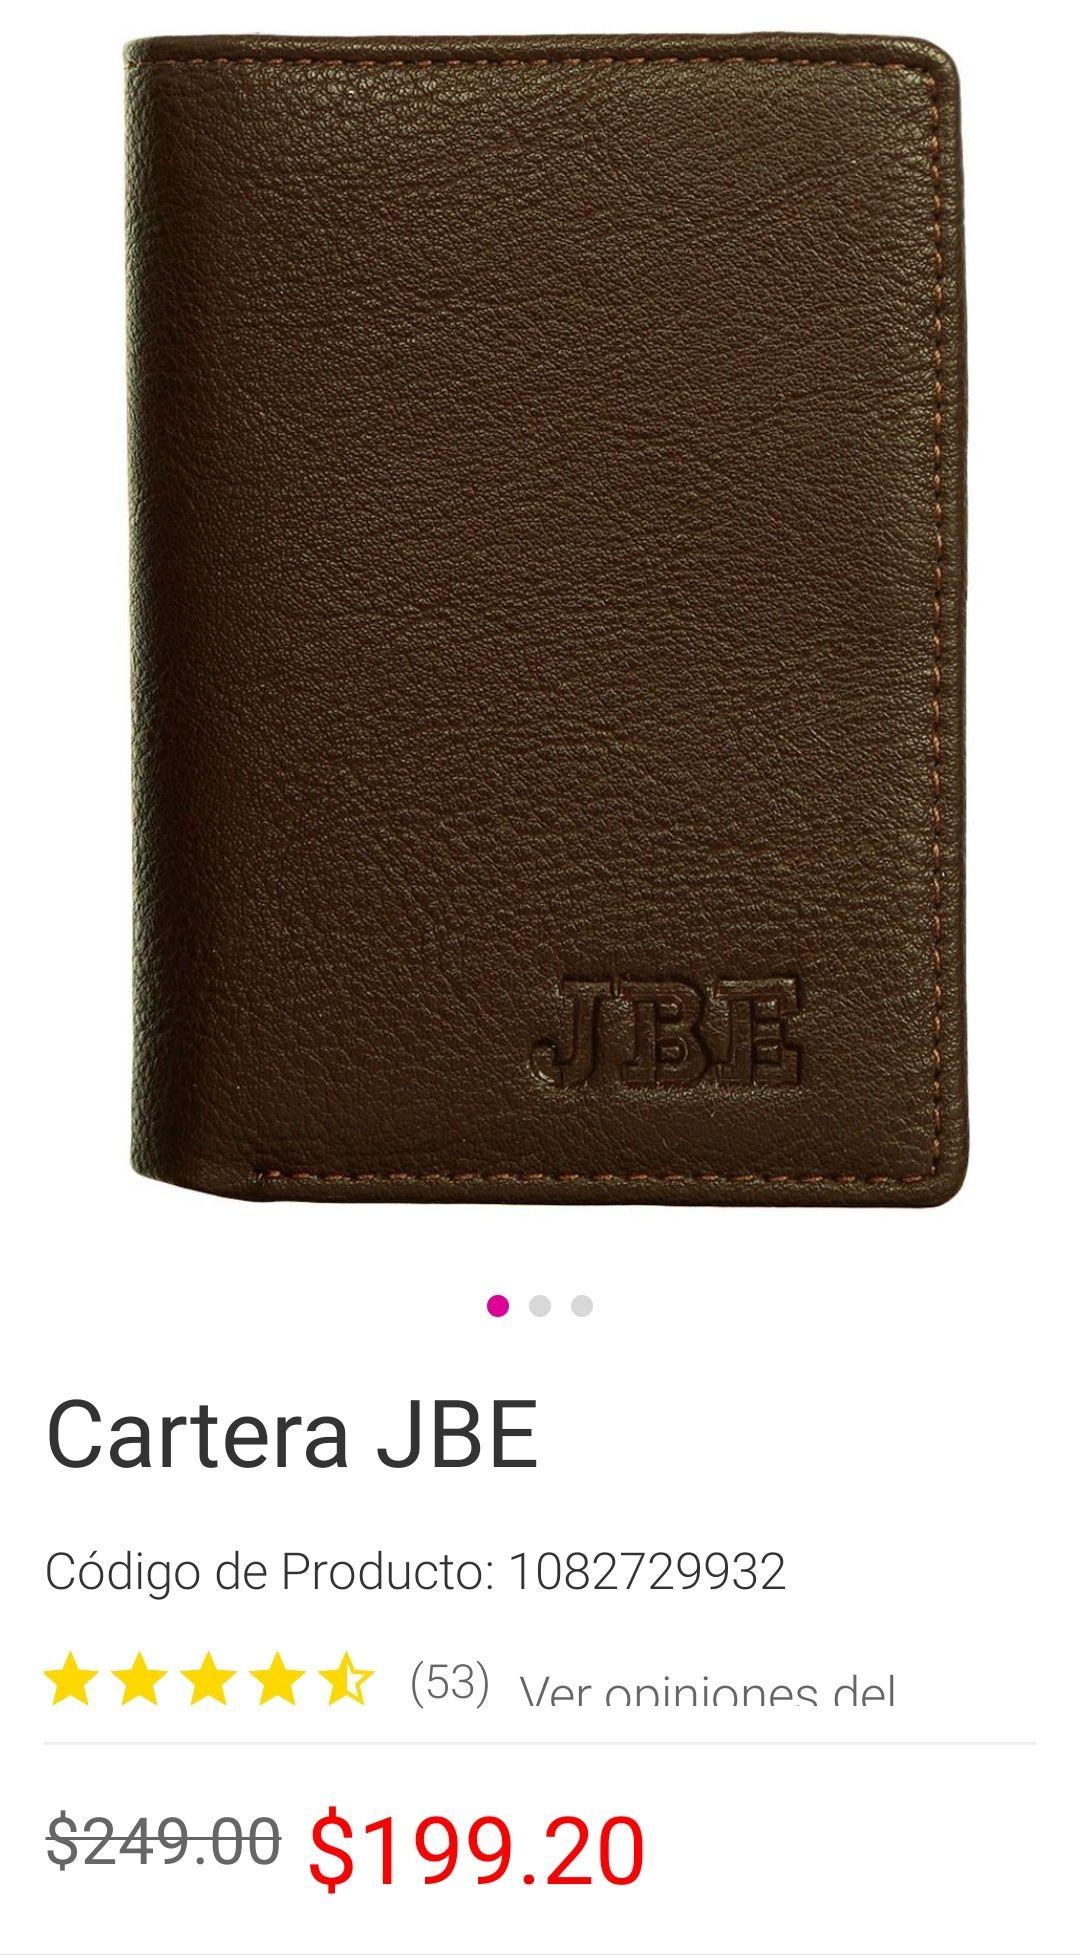 Liverpool: Cartera JBE